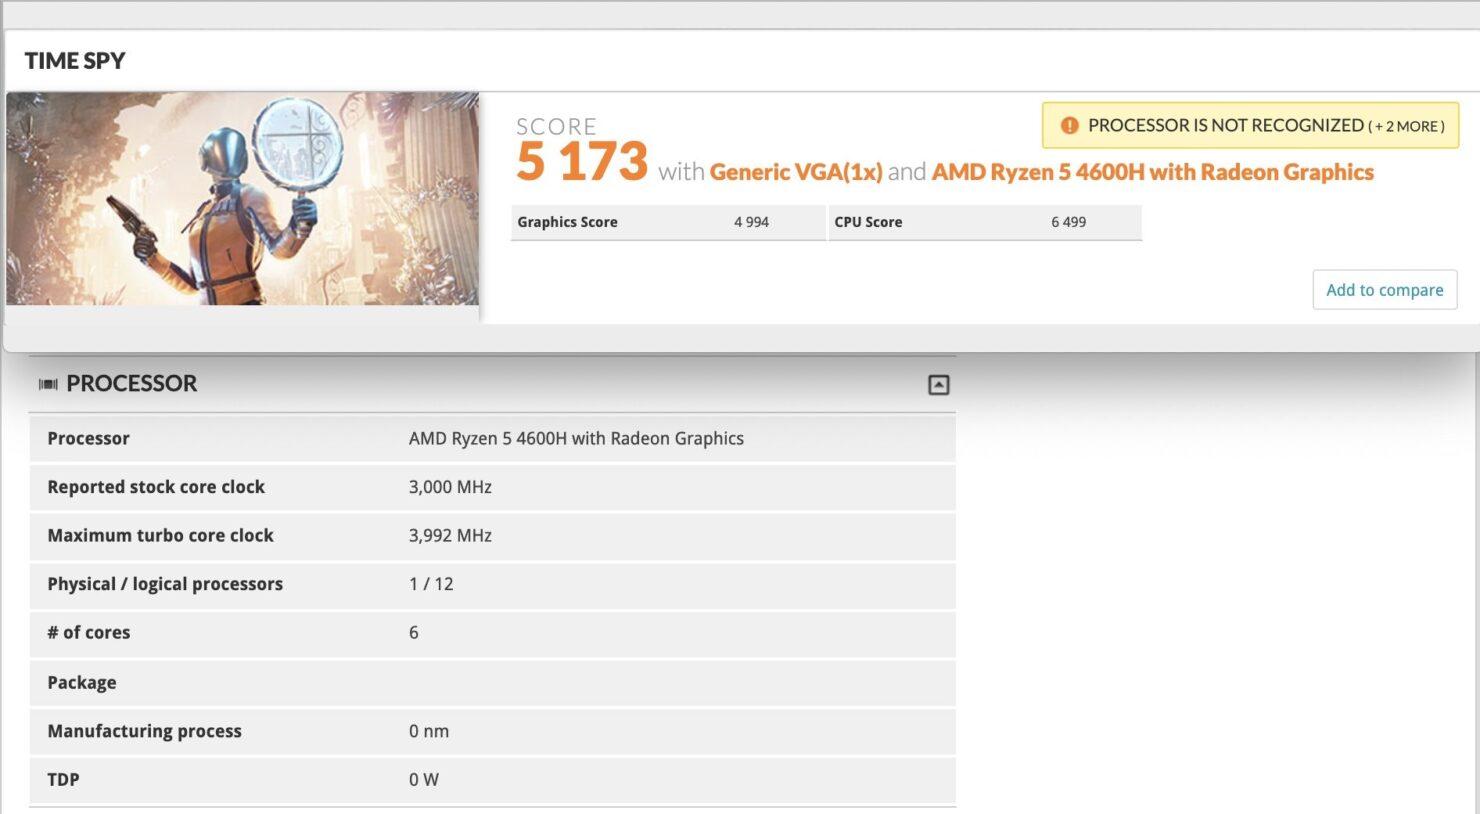 amd-ryzen-5-4600h-3dmark-time-spy-cpu-performance-benchmark